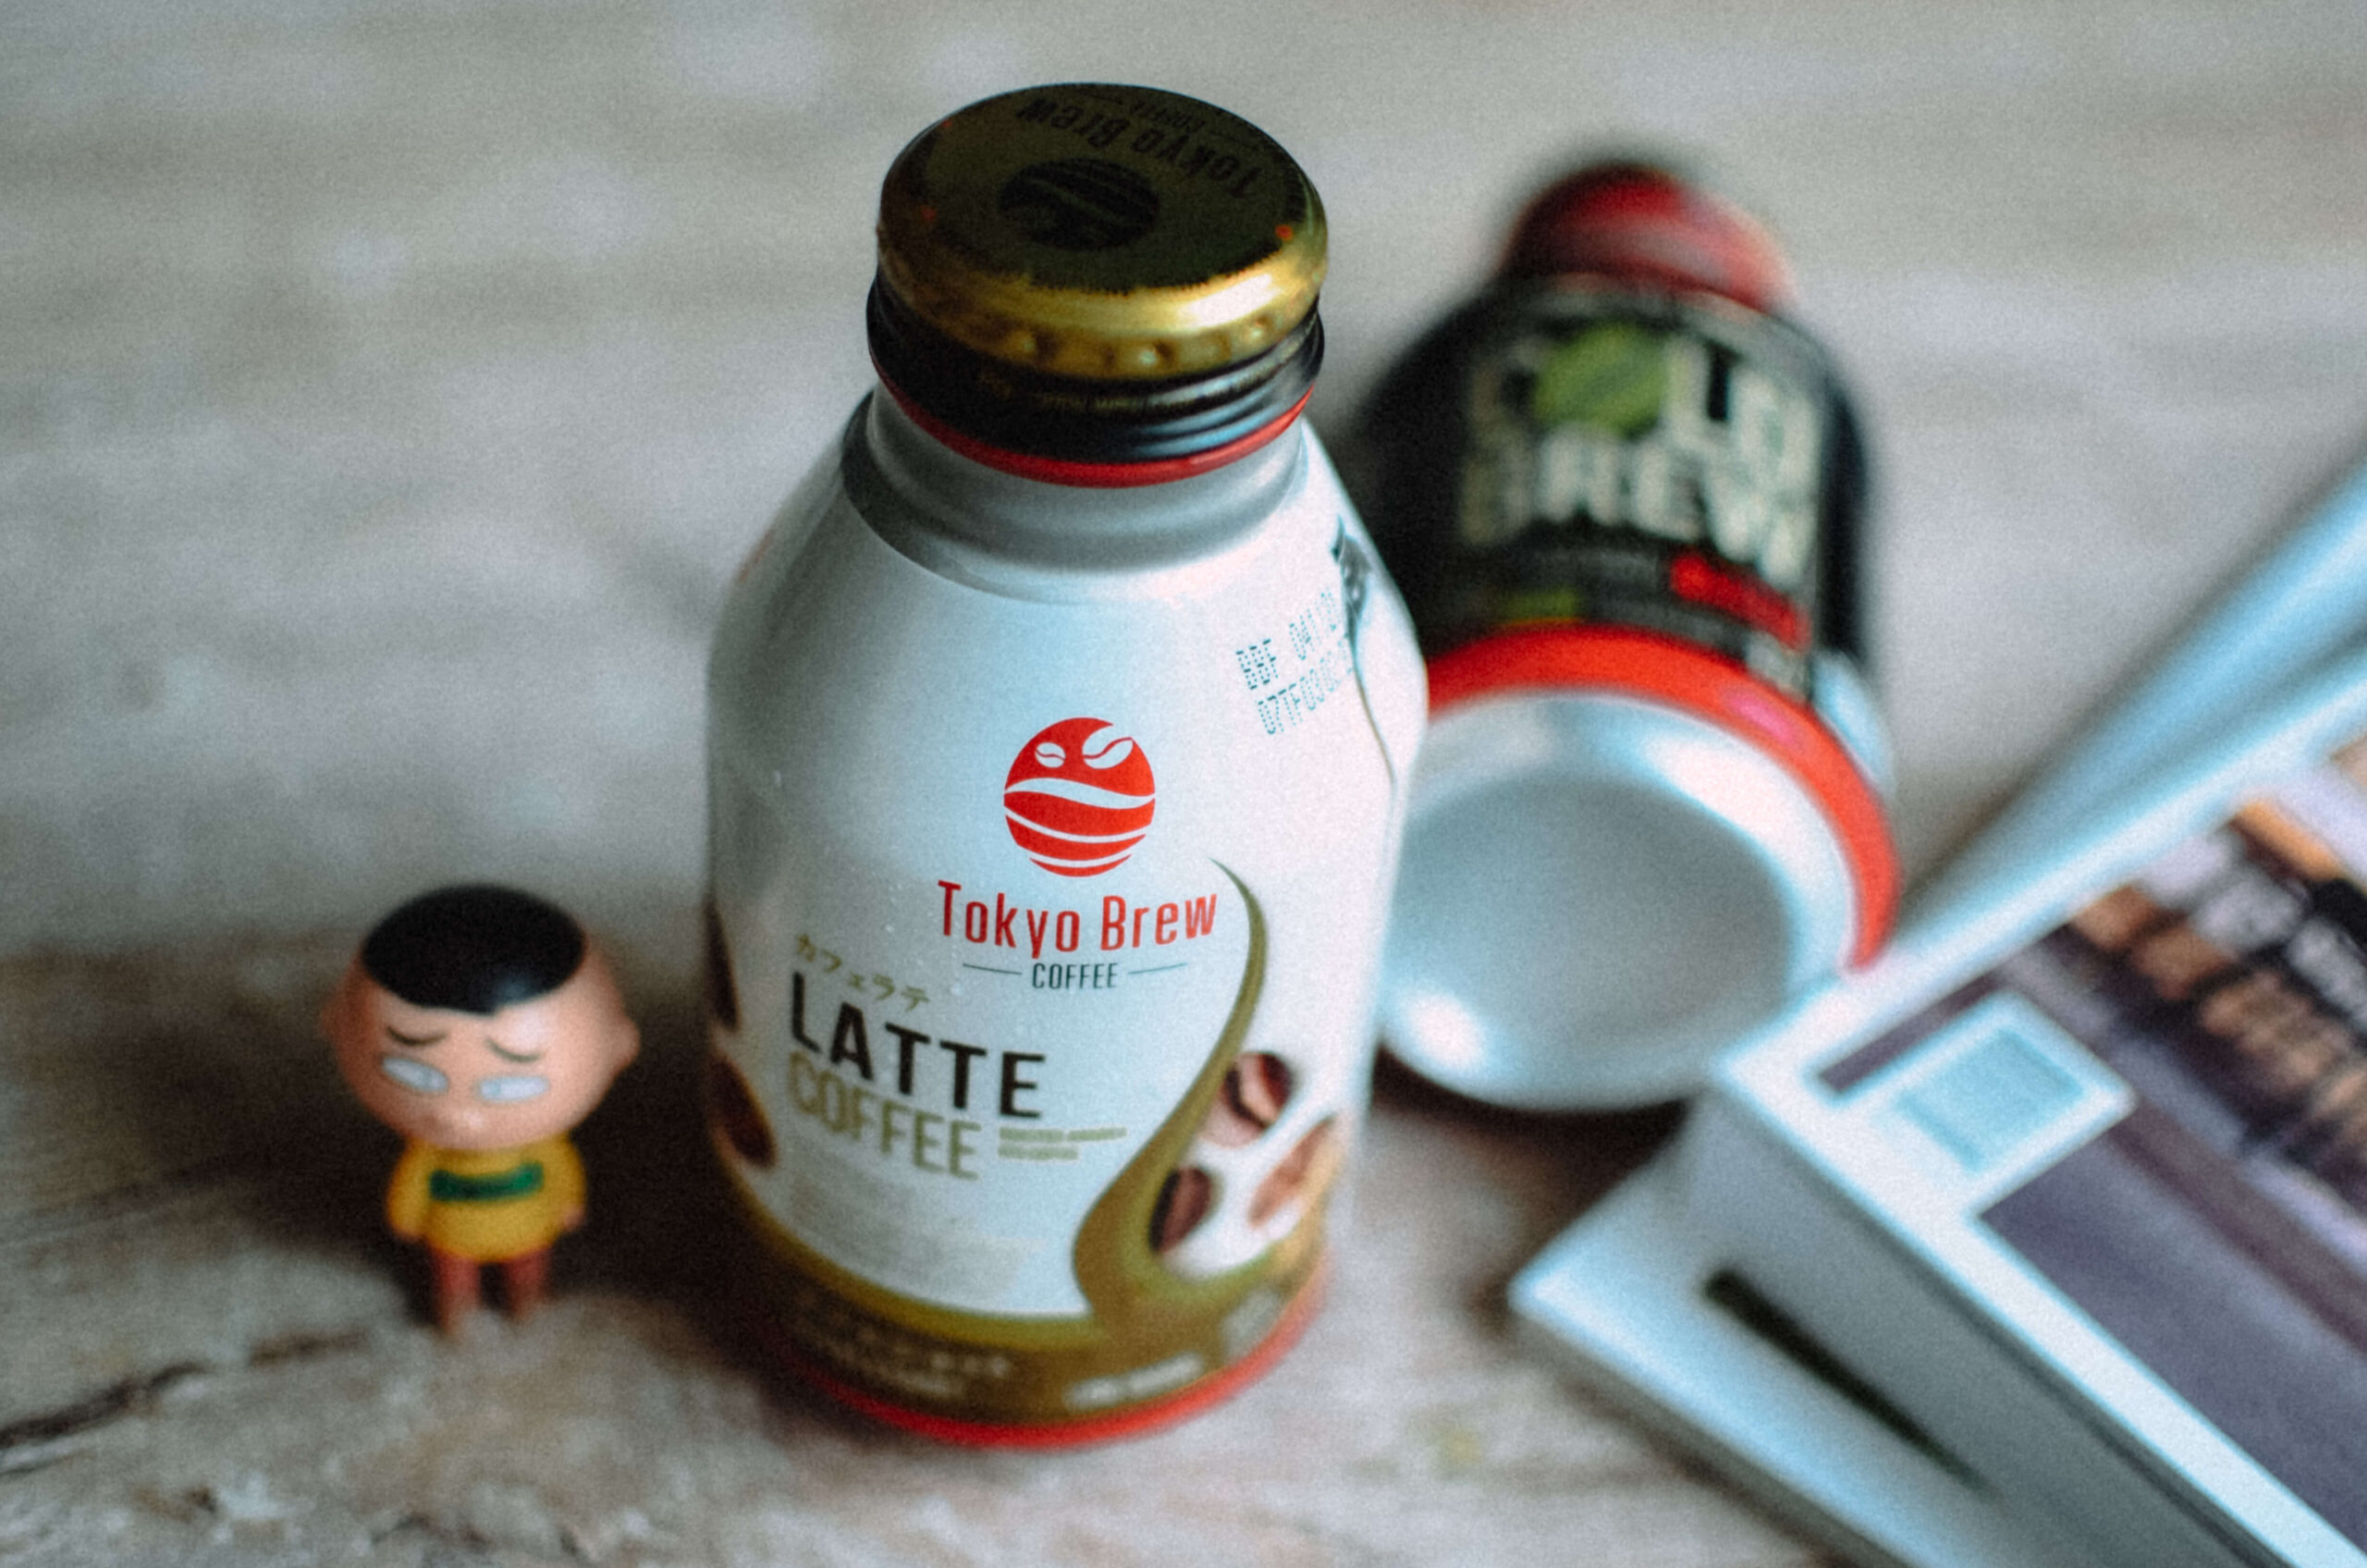 tokyo brew coffee Latte